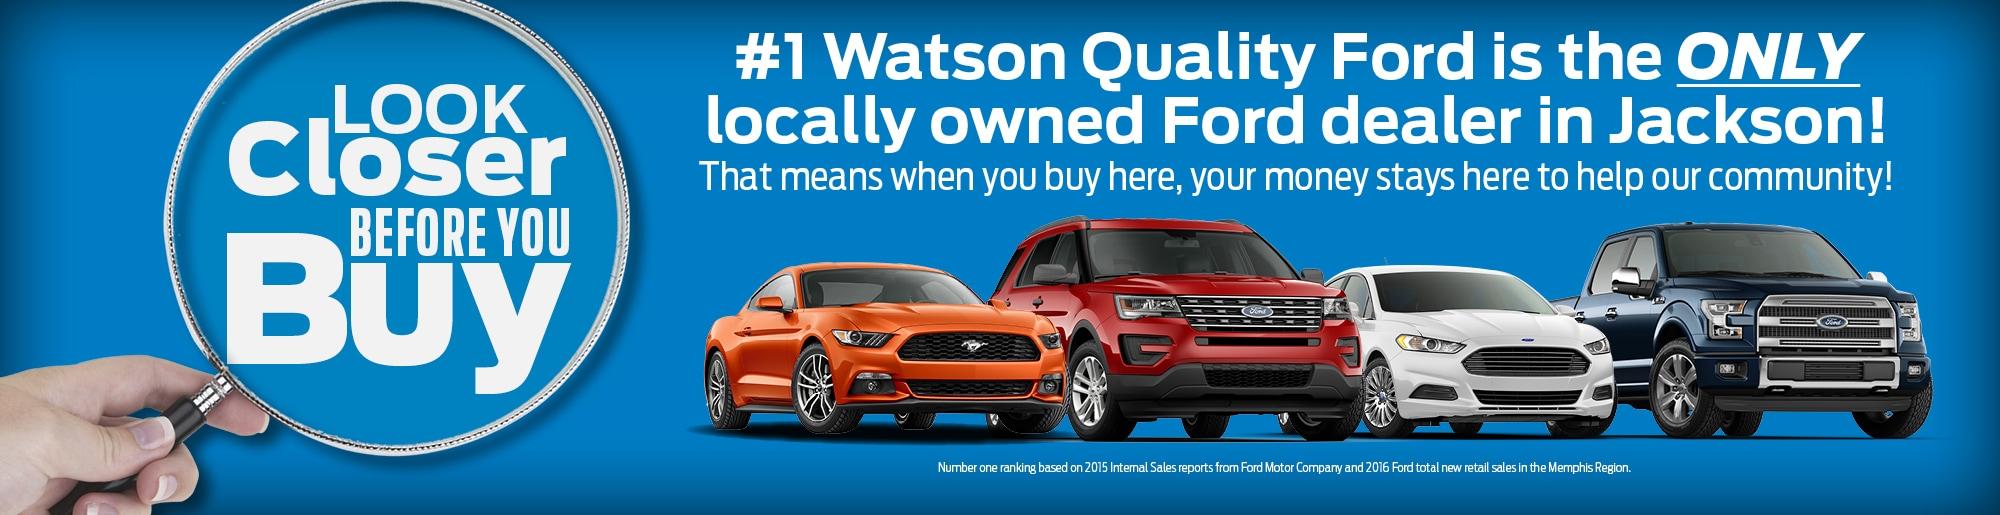 Jackson Watson Quality Ford Inc New Used Ford Cars Ridgeland Ms